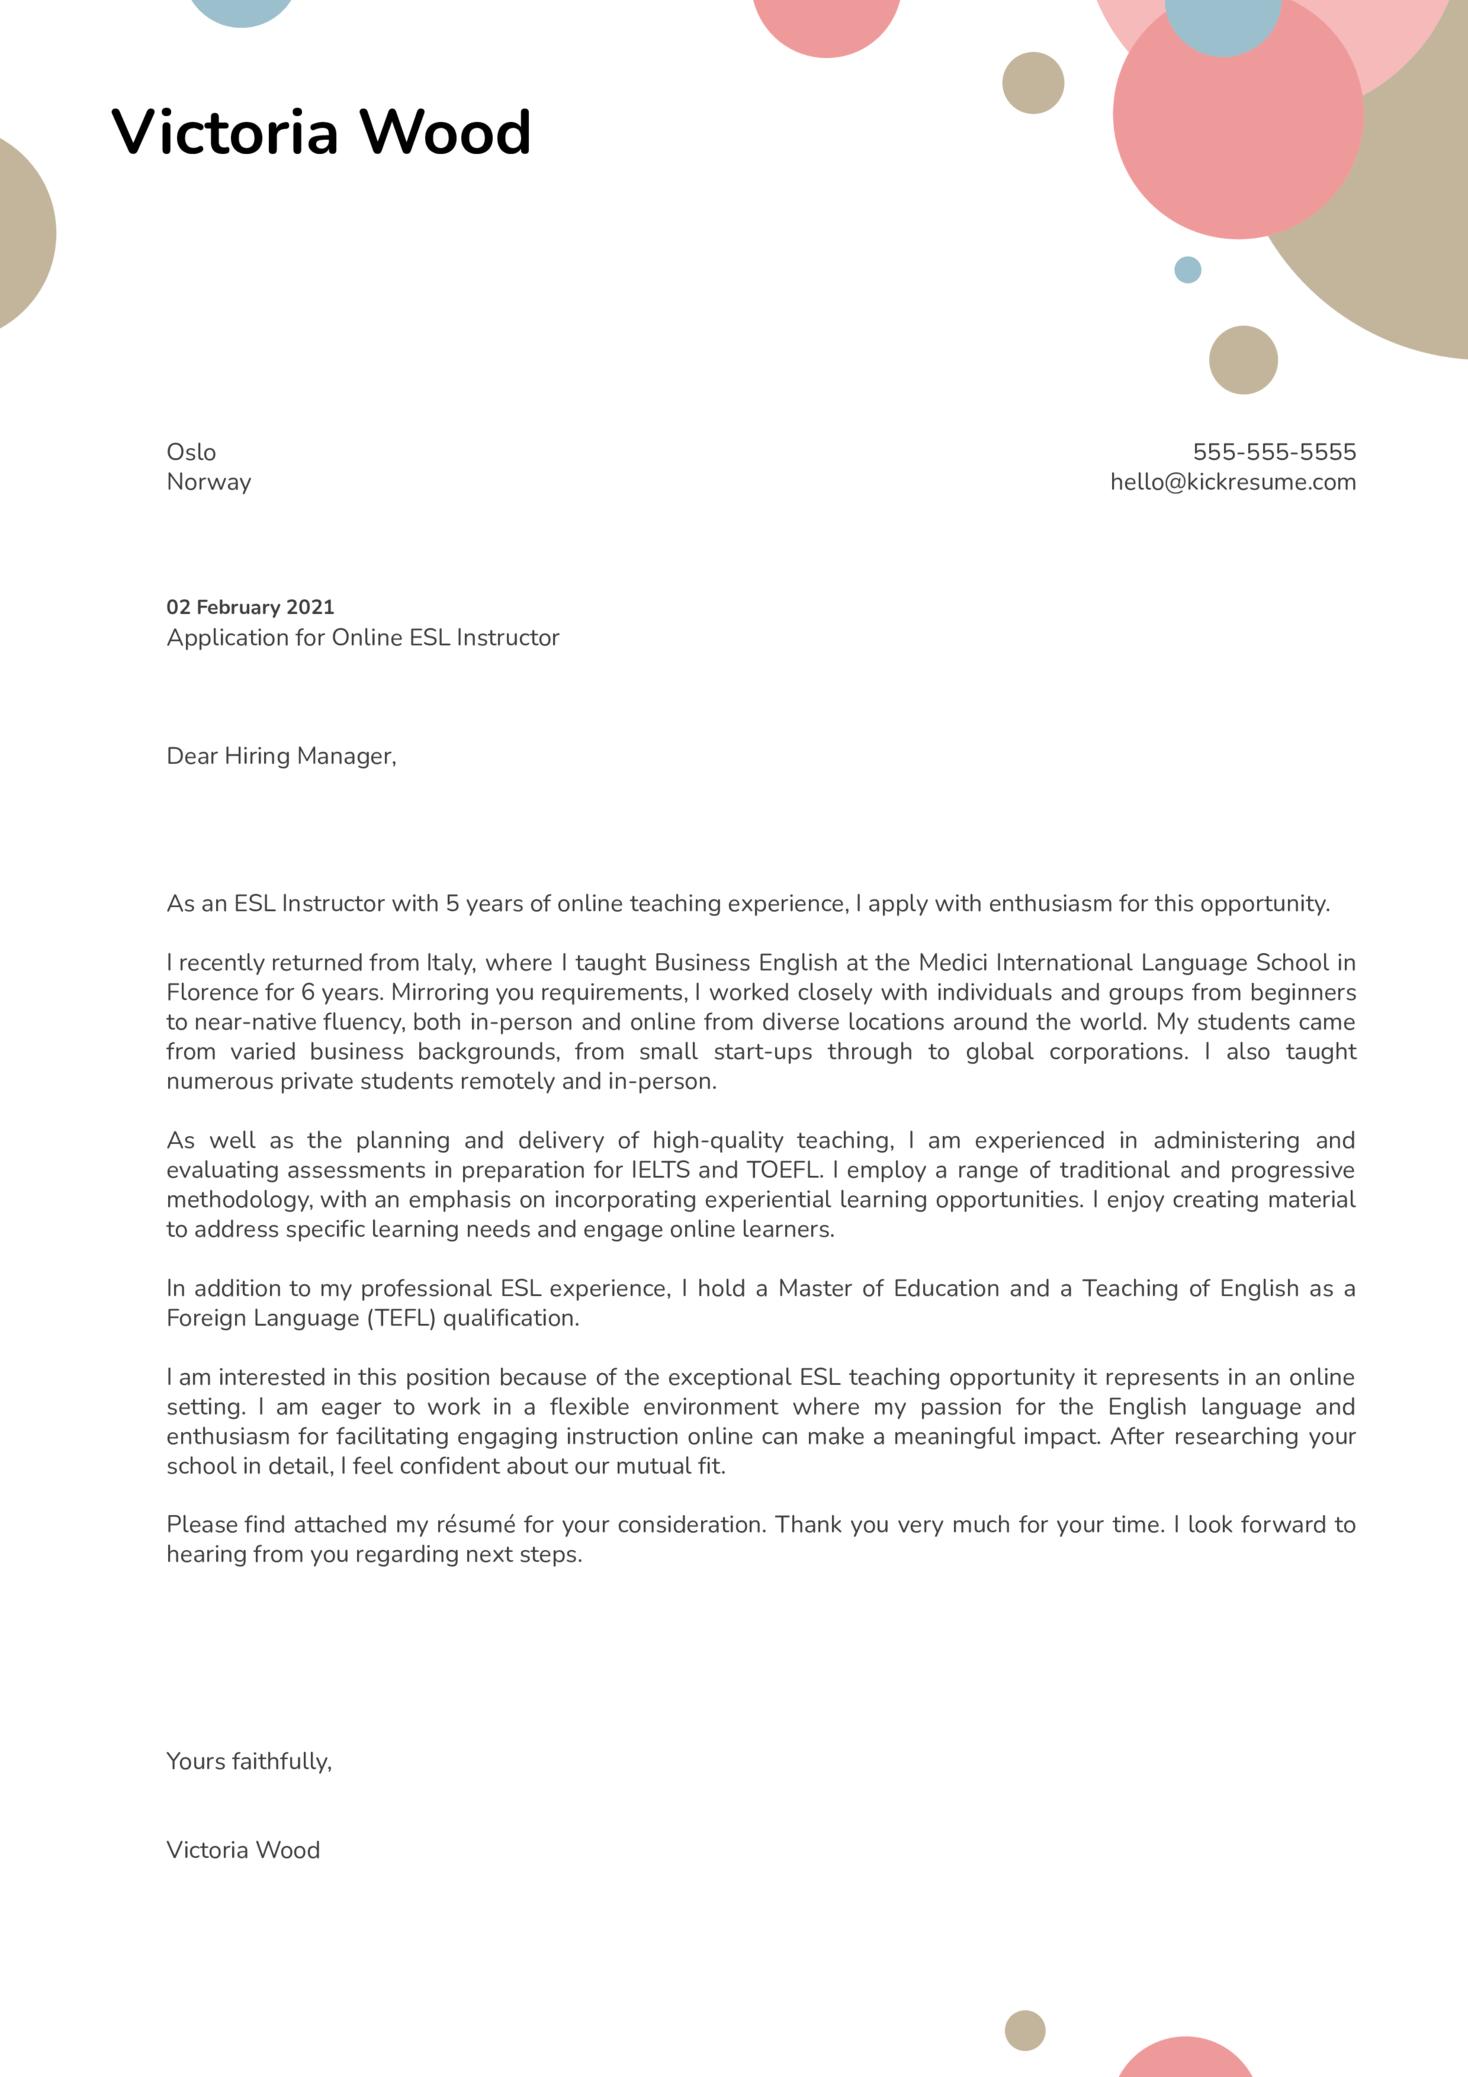 Online ESL Instructor Cover Letter Example